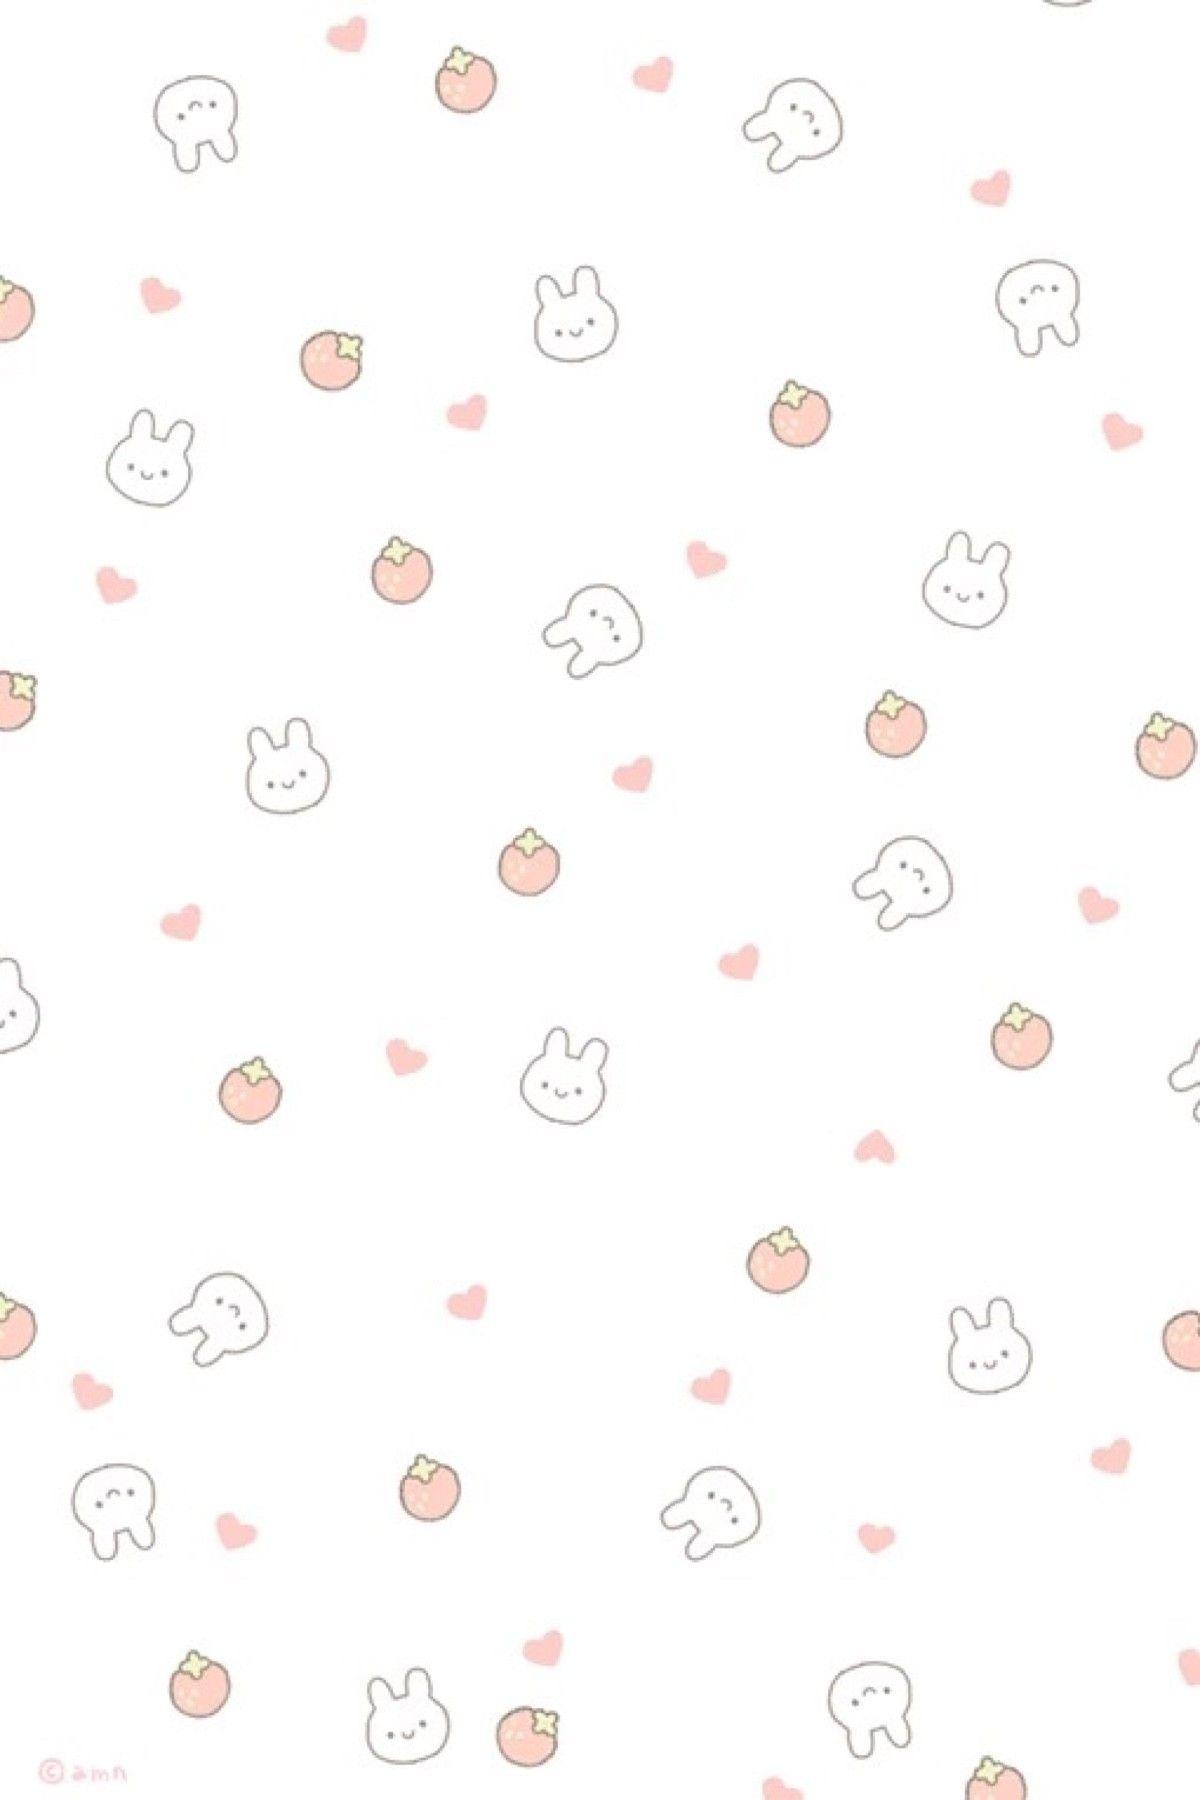 Cute Aesthetic Patterns : aesthetic, patterns, Aesthetic, Pattern, Wallpapers, Wallpaper